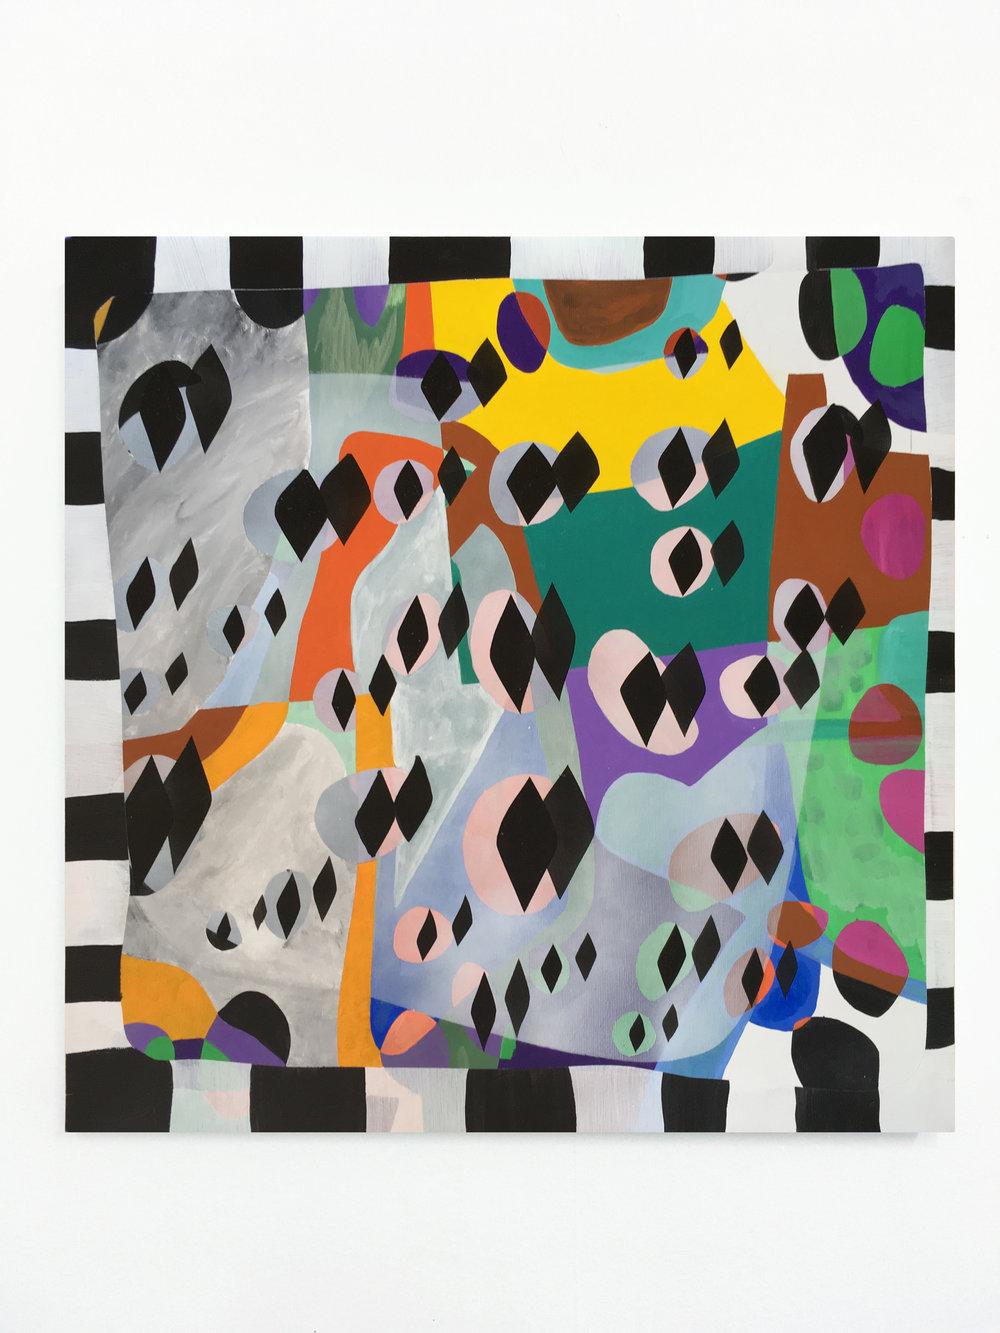 "Brett Flanigan -"" Entanglement "".Acrylic on Canvas.23.5 x 23.5 Inches.2018."